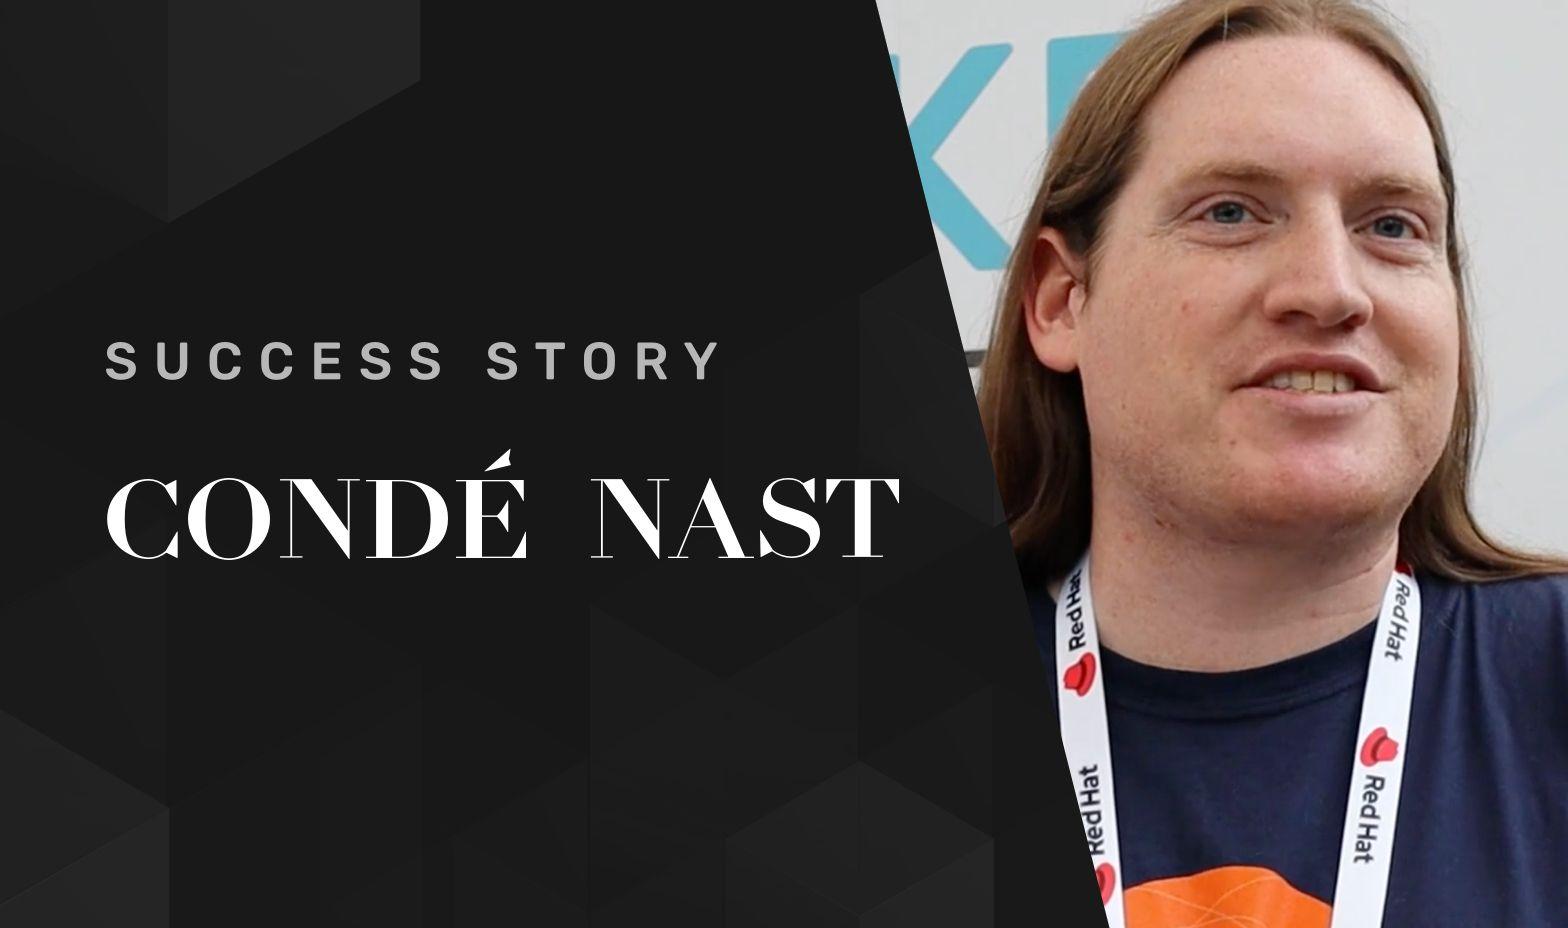 Condé Nast International Success Story